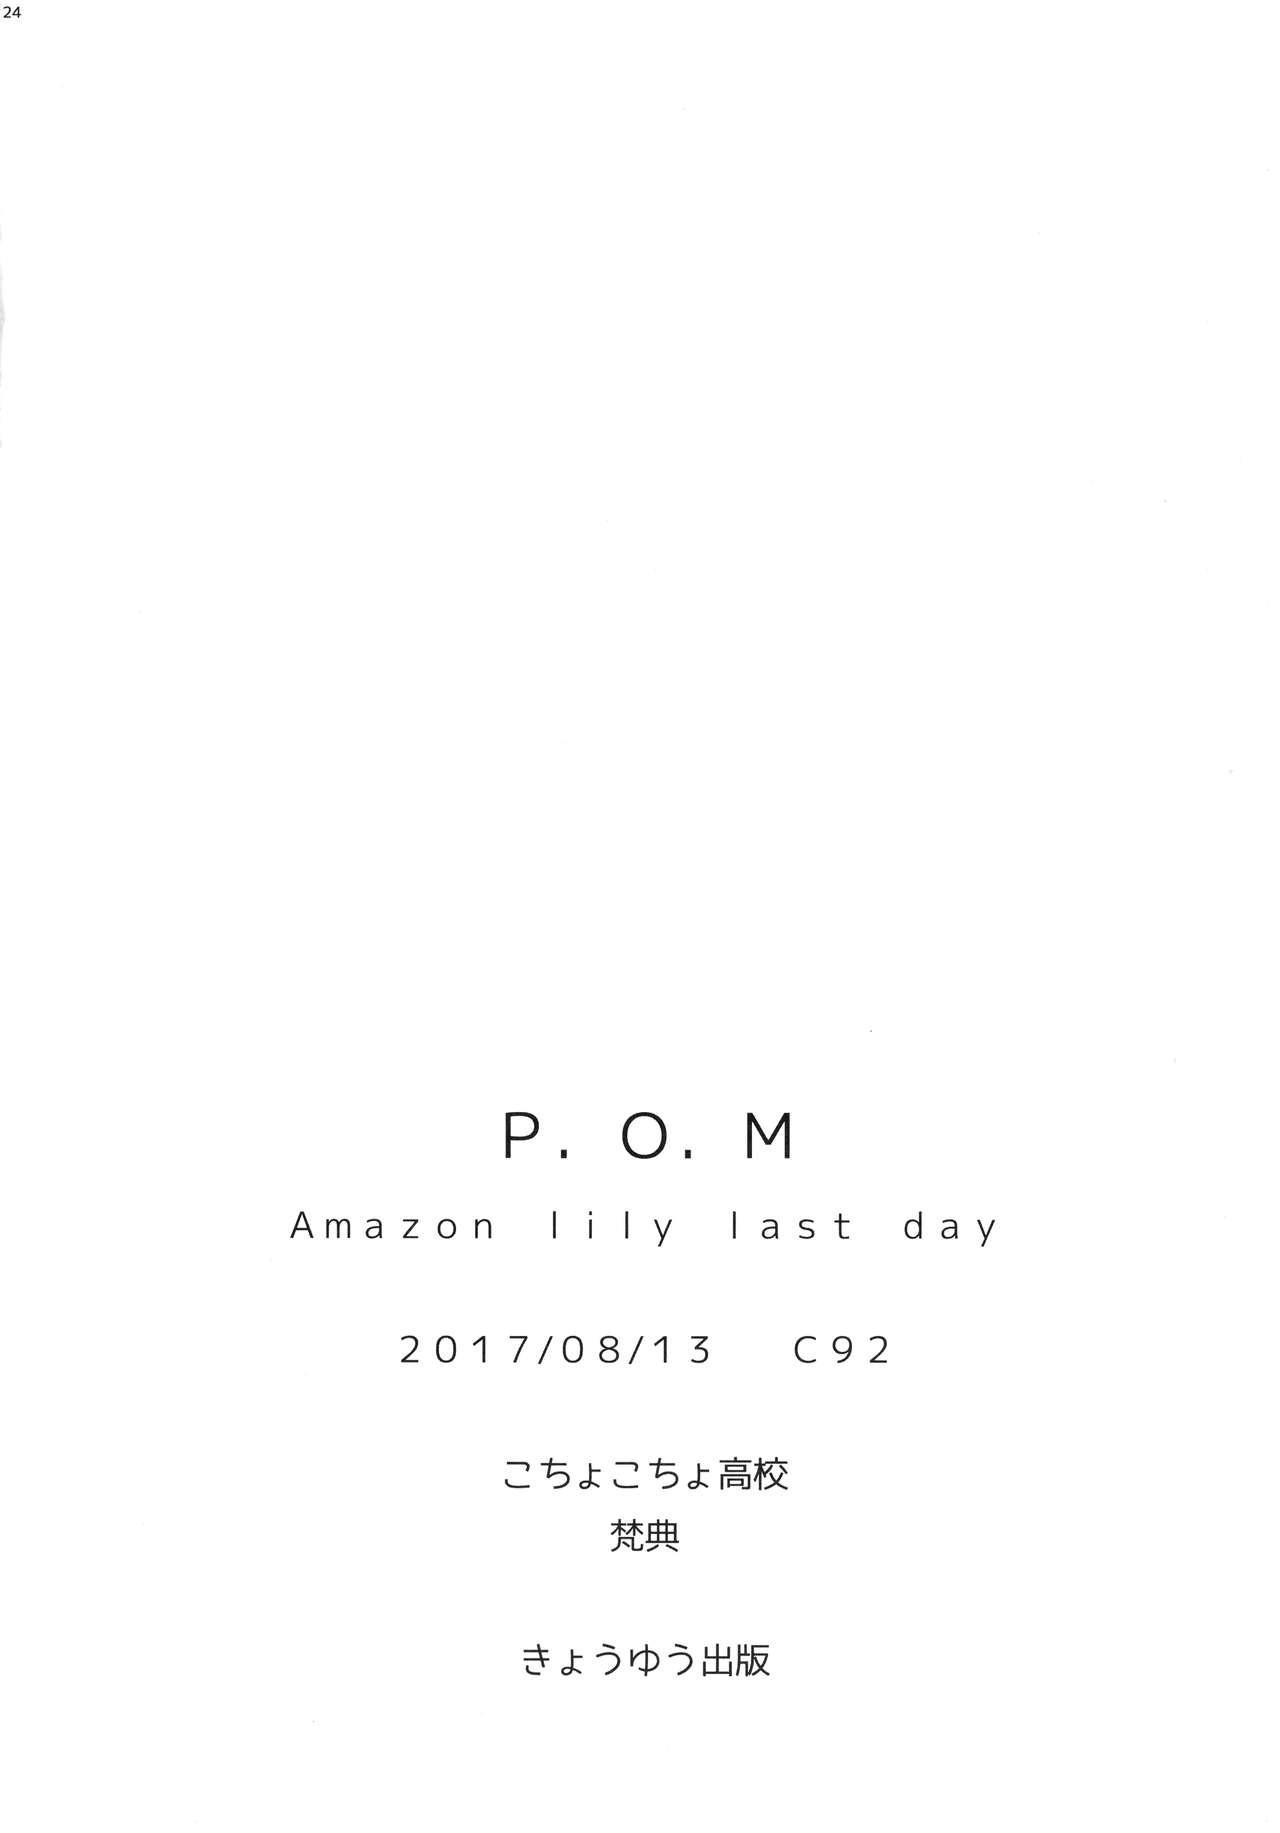 P.O.M Amazon lily last day 25